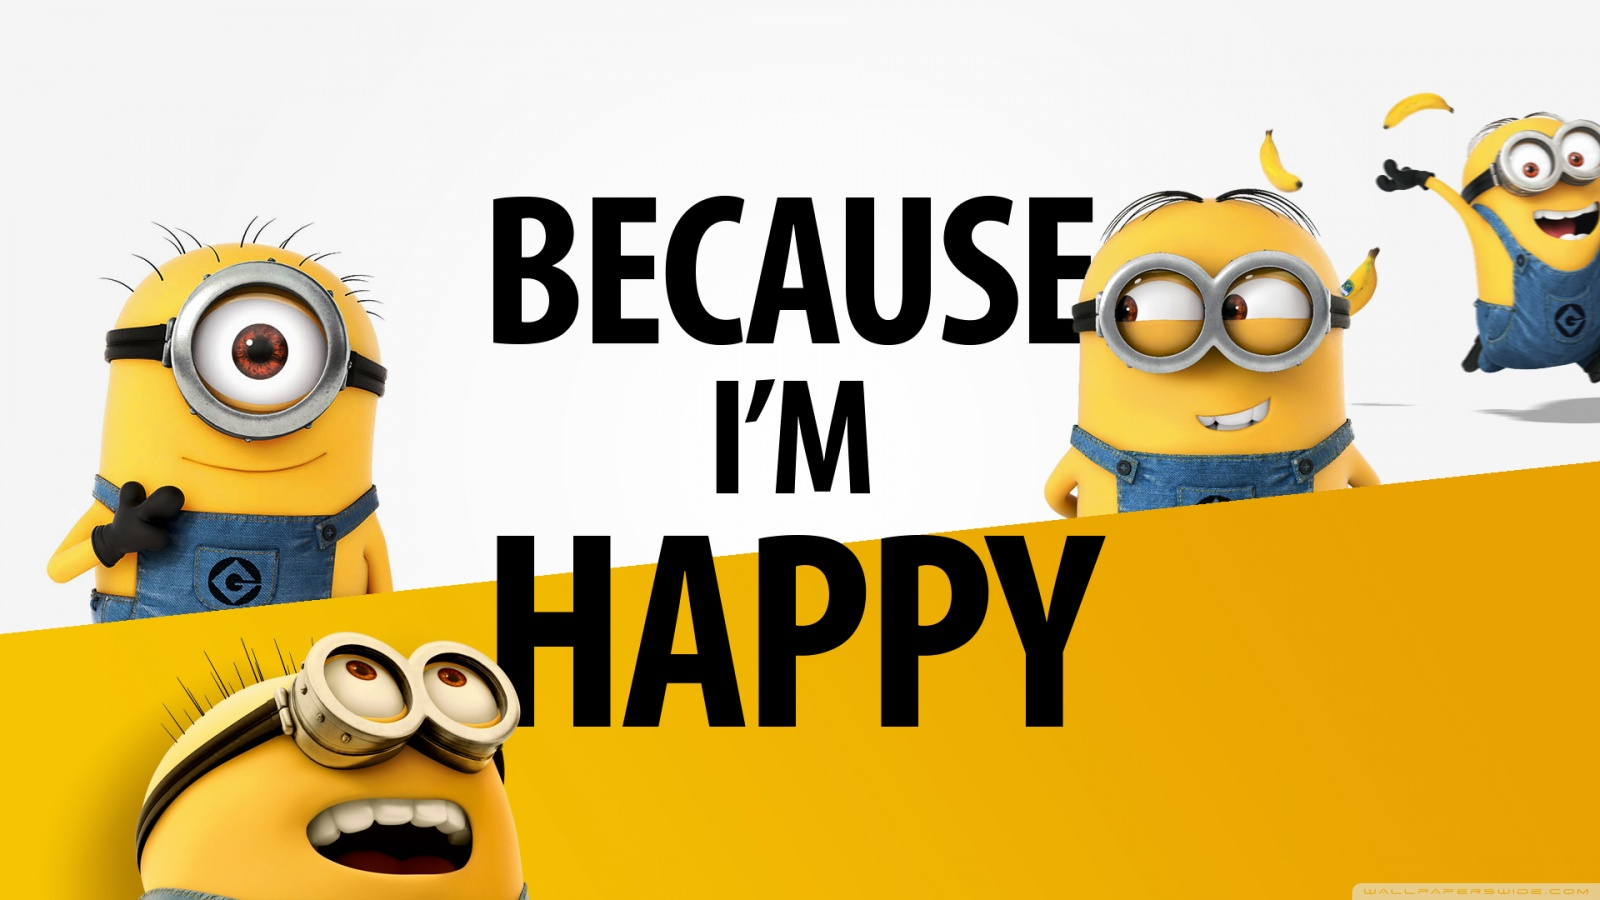 Free Because_Im_Happy phone wallpaper by chardinbrittney